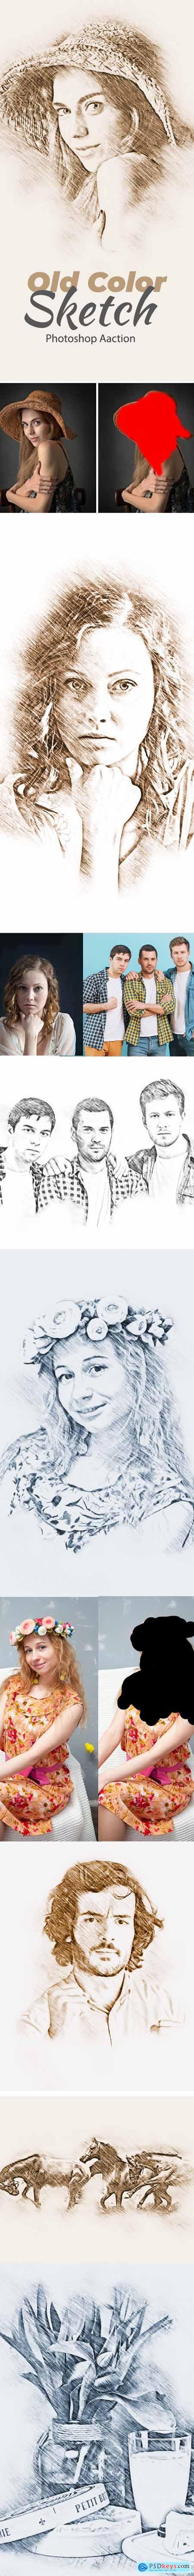 Old Color Sketch Photoshop Action 24277092